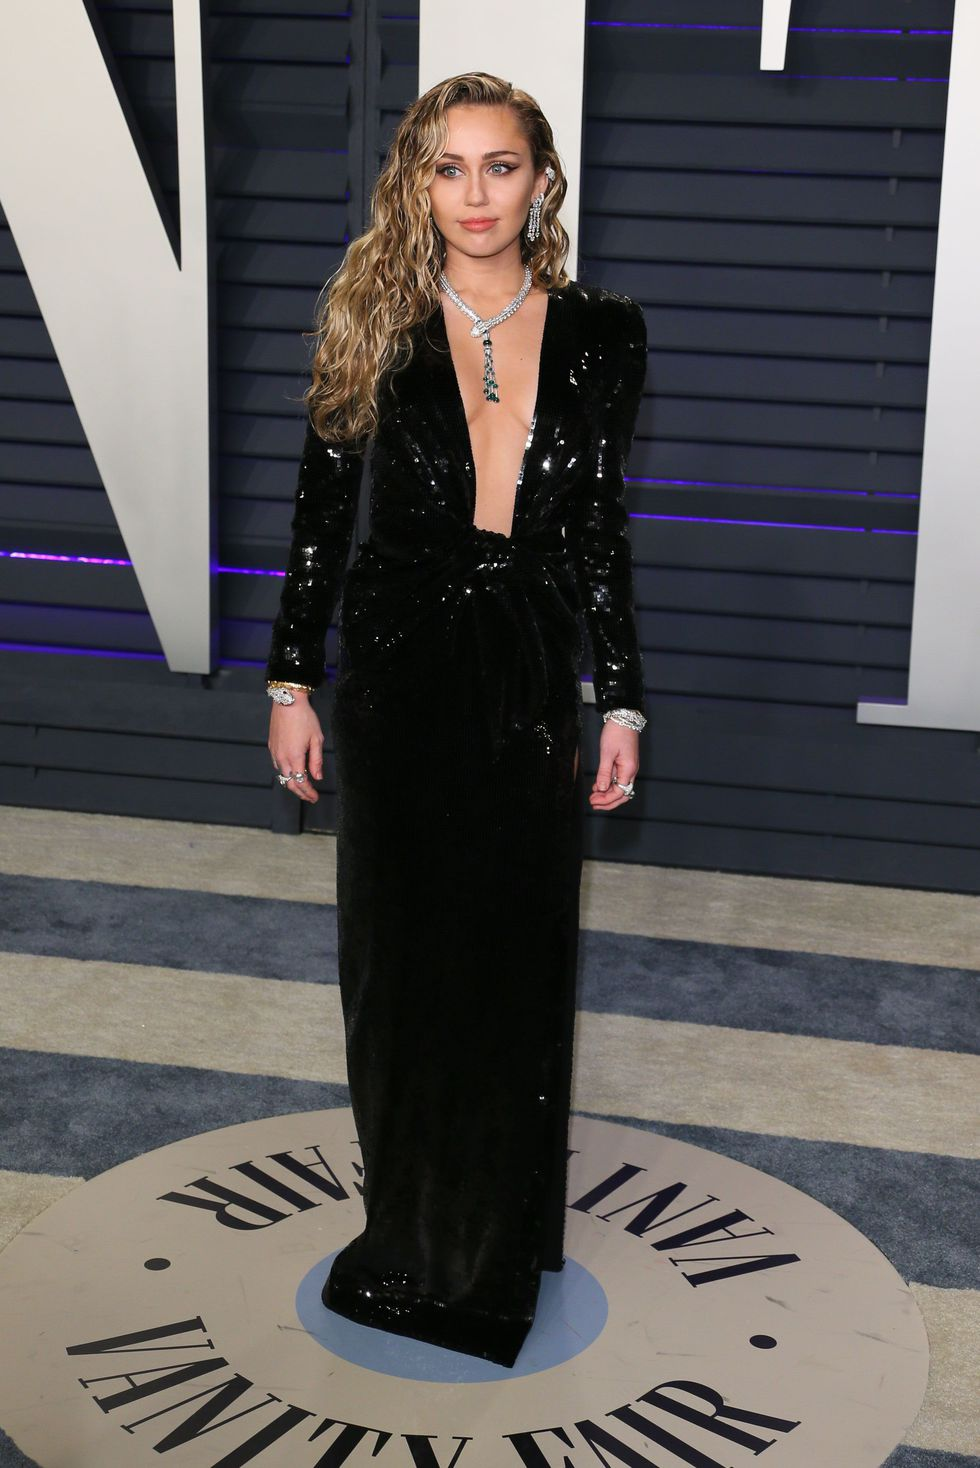 Oscar 2019 afterparty Miley Cyrus